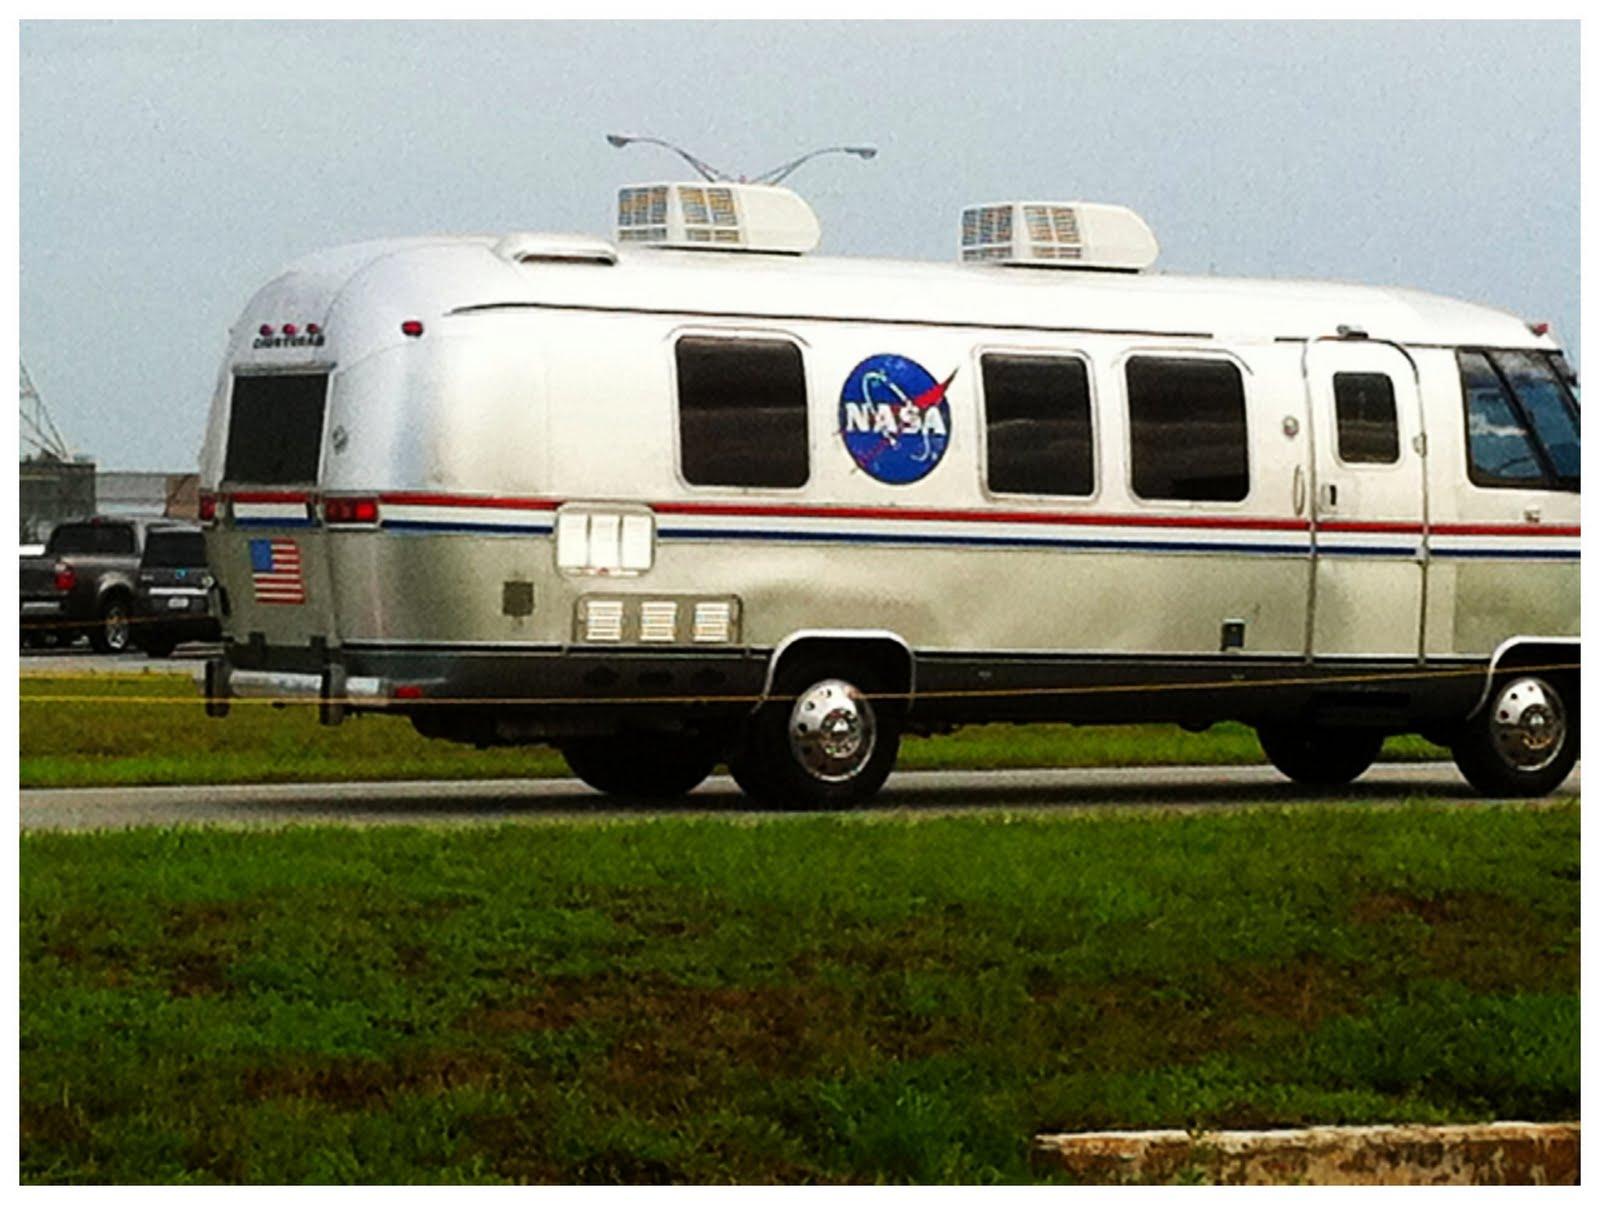 astro van engine life